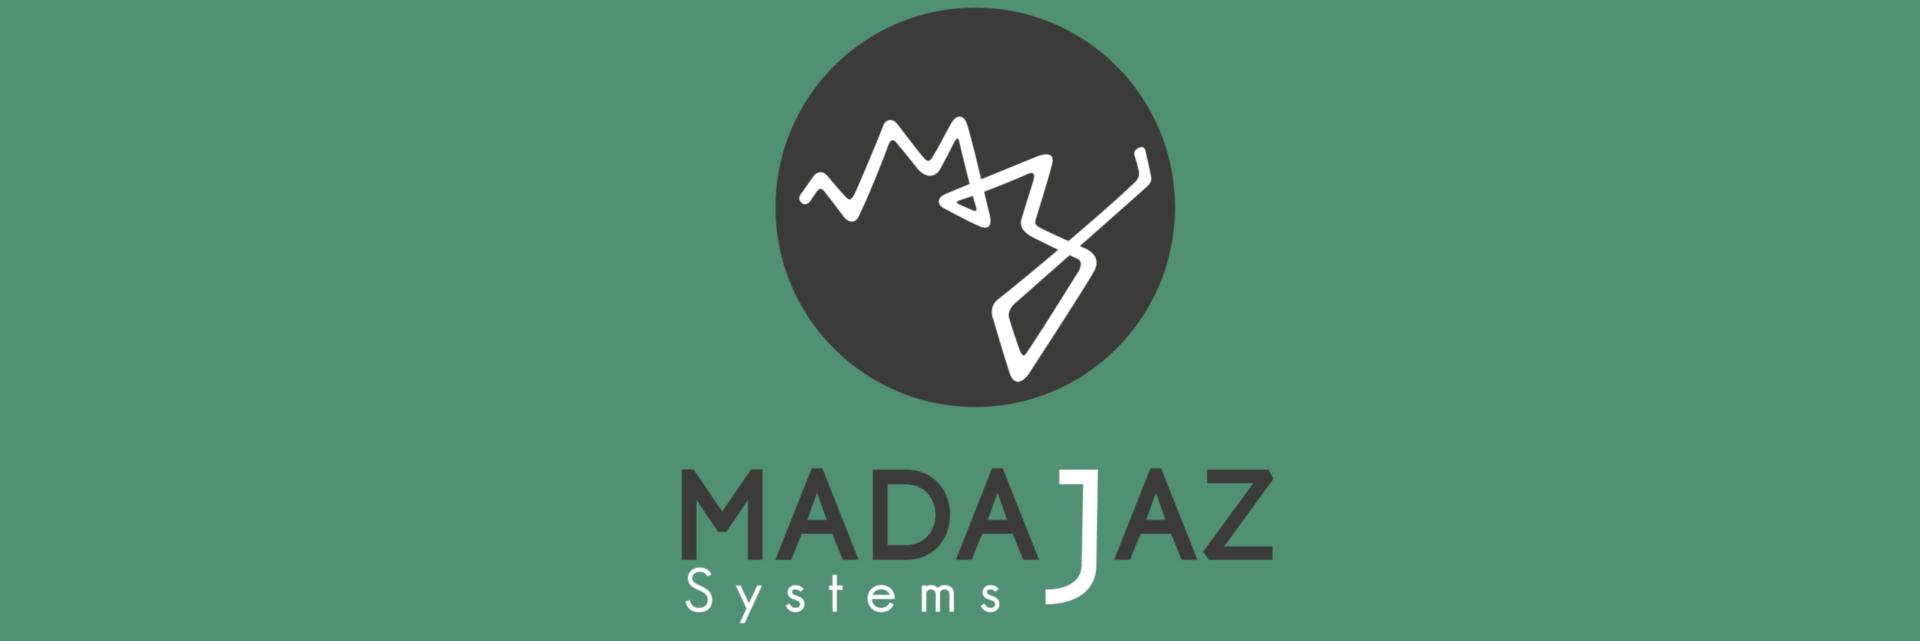 Madajaz Systems